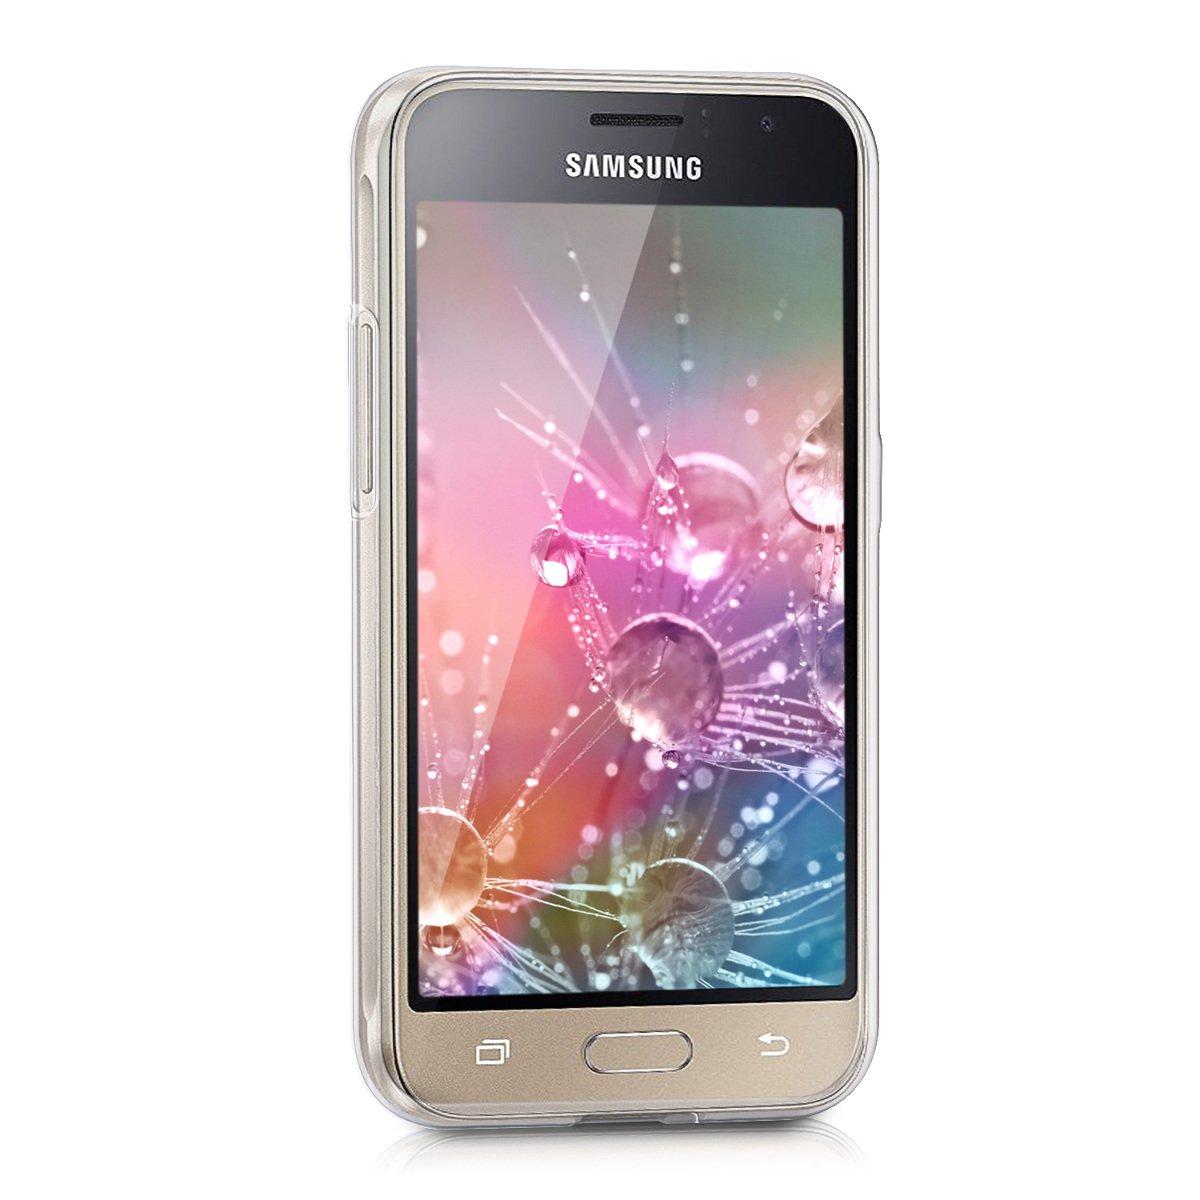 kwmobile Funda para Samsung Galaxy J1 (2016) - Carcasa de [TPU] para móvil y diseño de Girasol Rosa Fucsia/Transparente